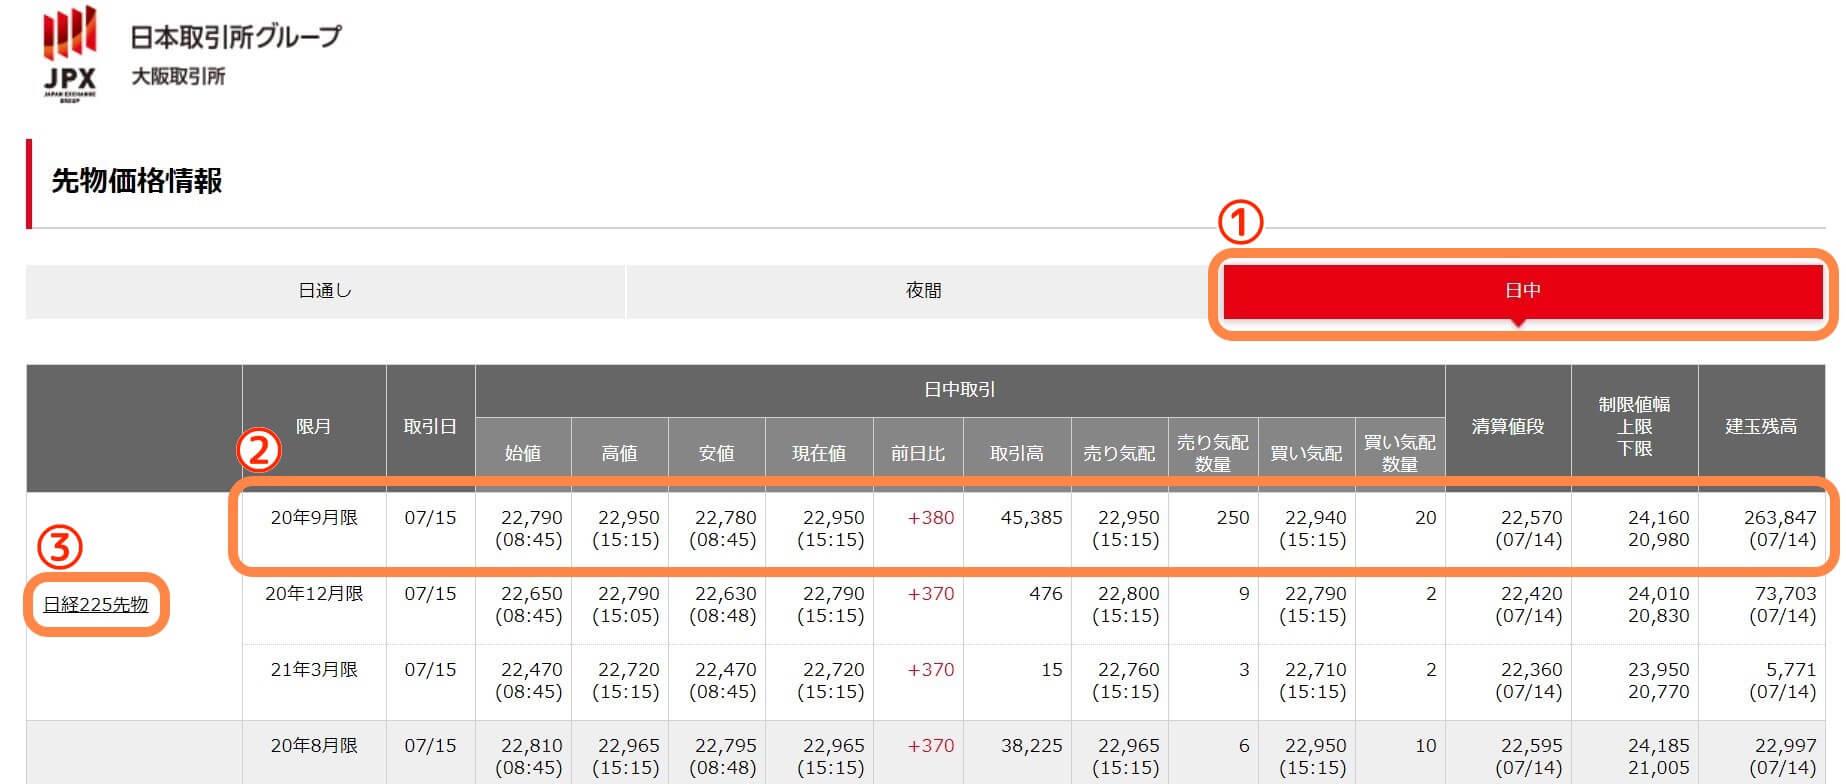 JPX:「先物価格情報」2020年7月15日現在